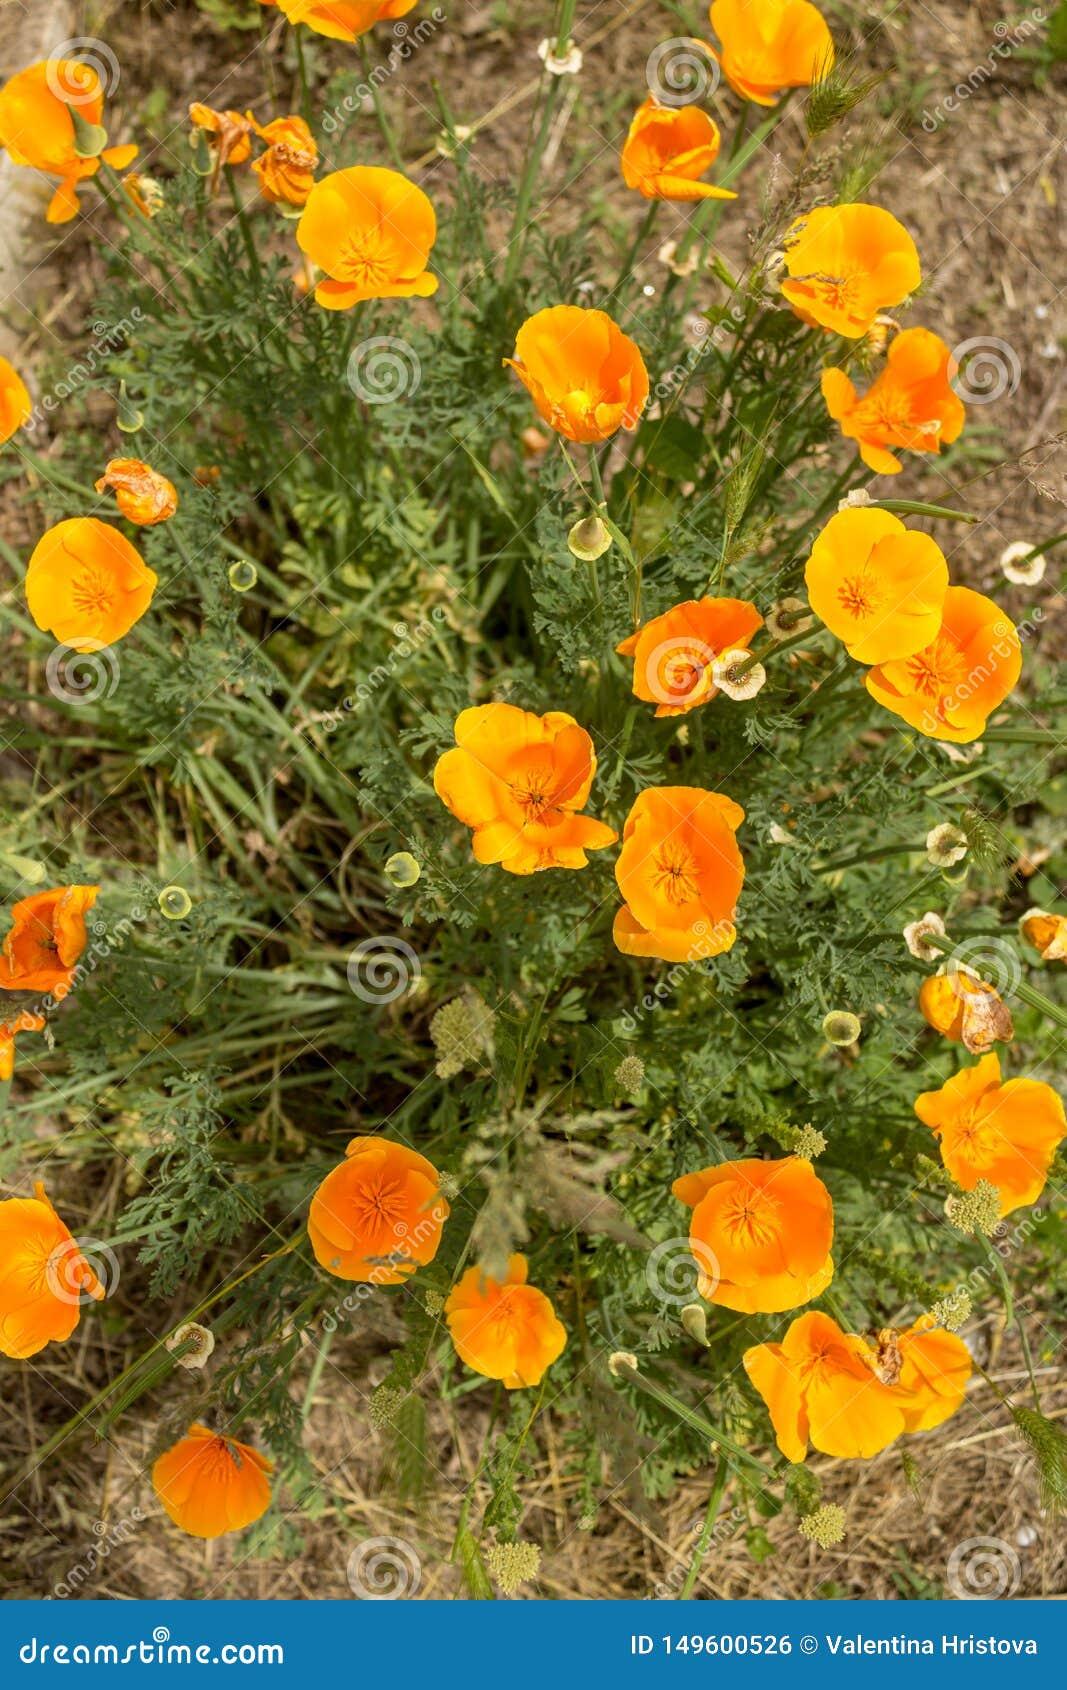 Brilliant buttercup yellow flowers of Eschscholzia californica Californian poppy,golden poppy, California sunlight, cup of gold